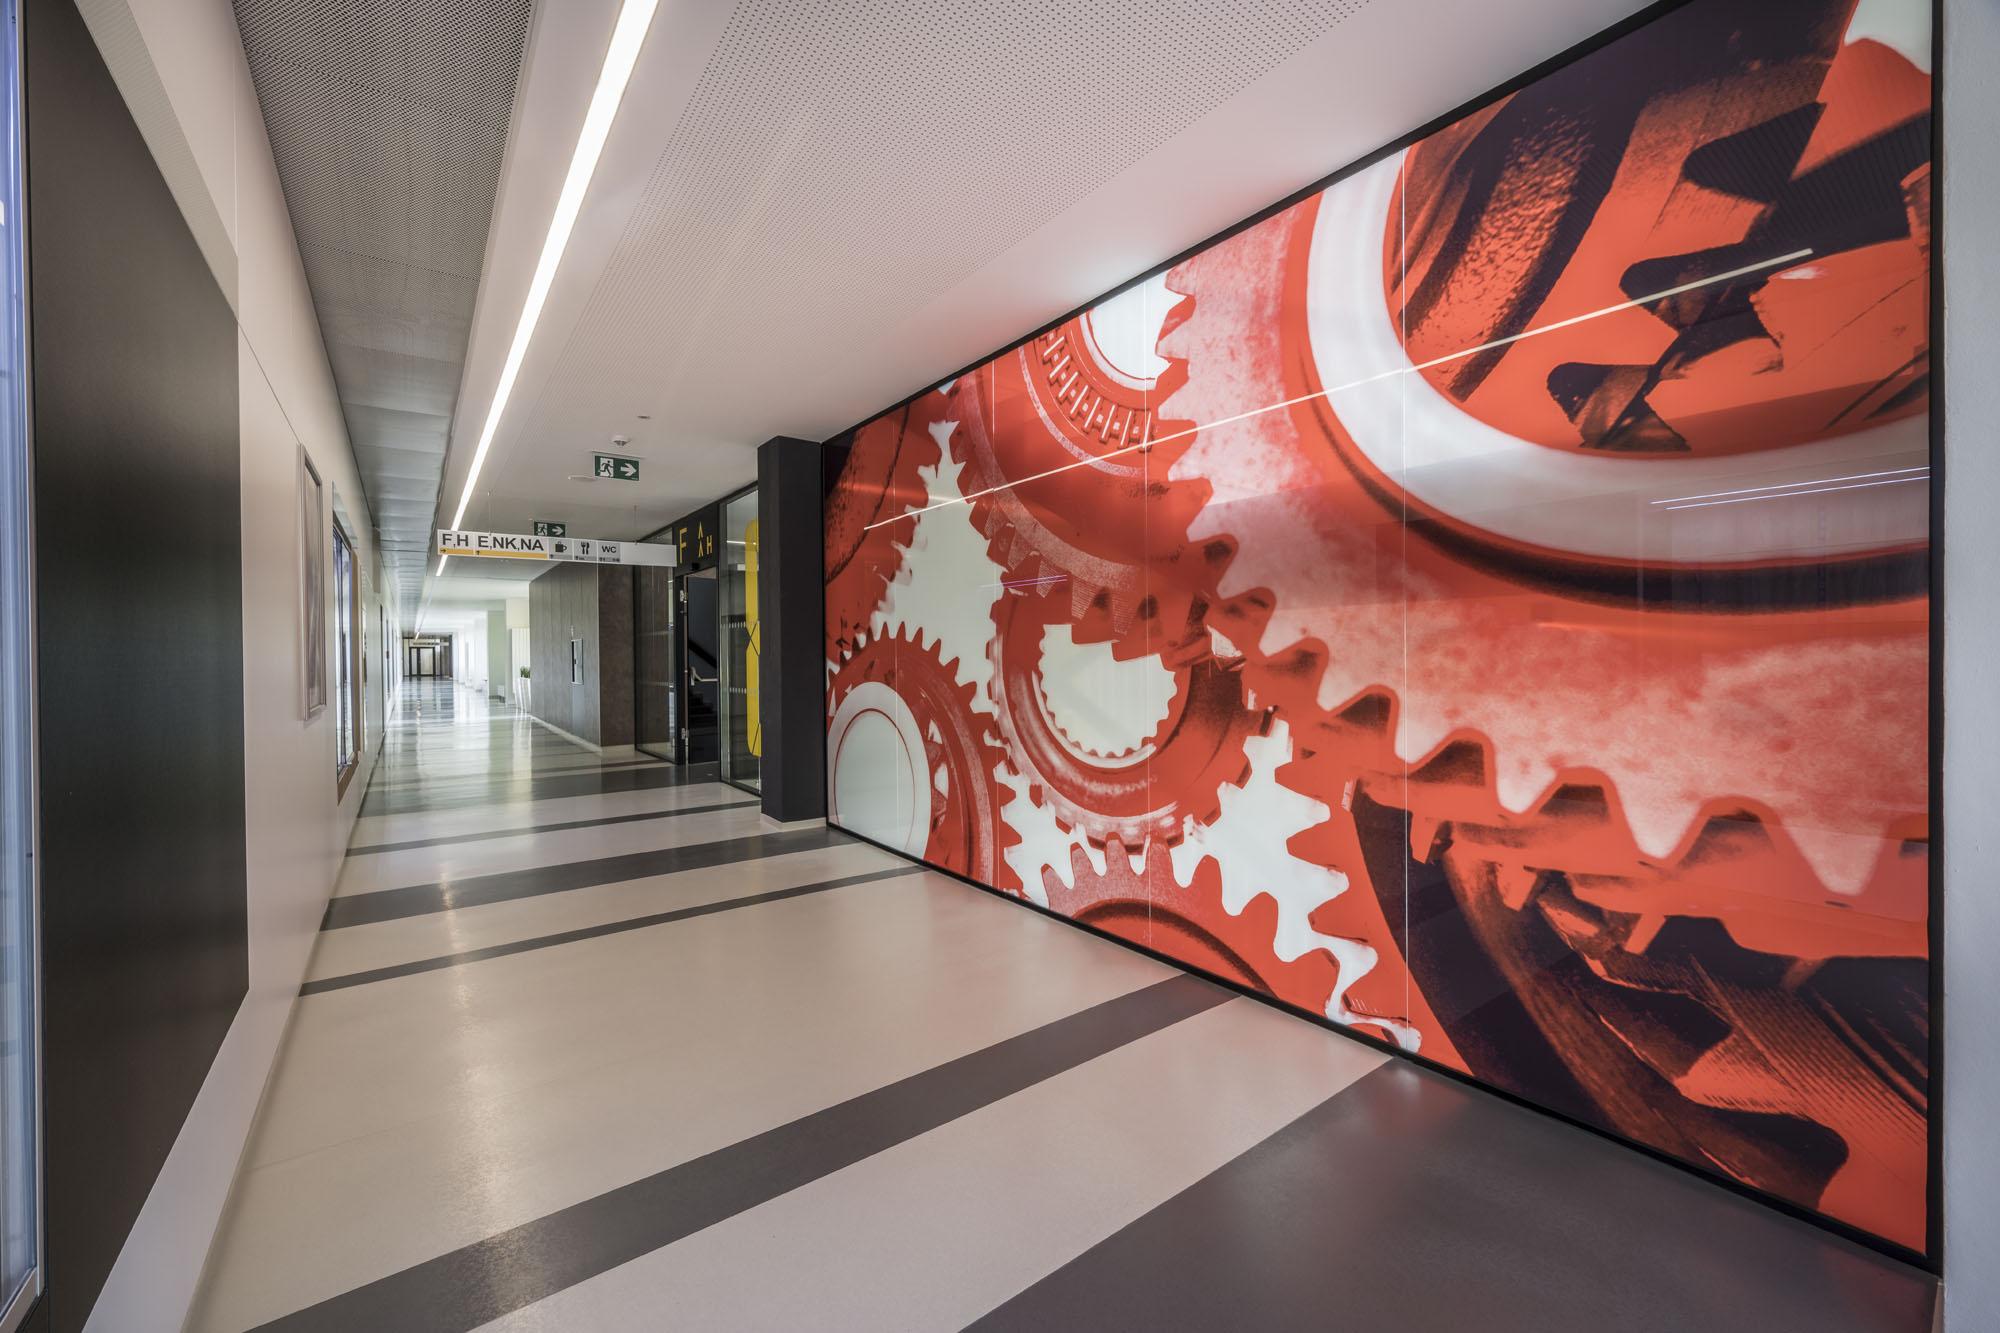 Corridor Design: Inventive Corridor Design